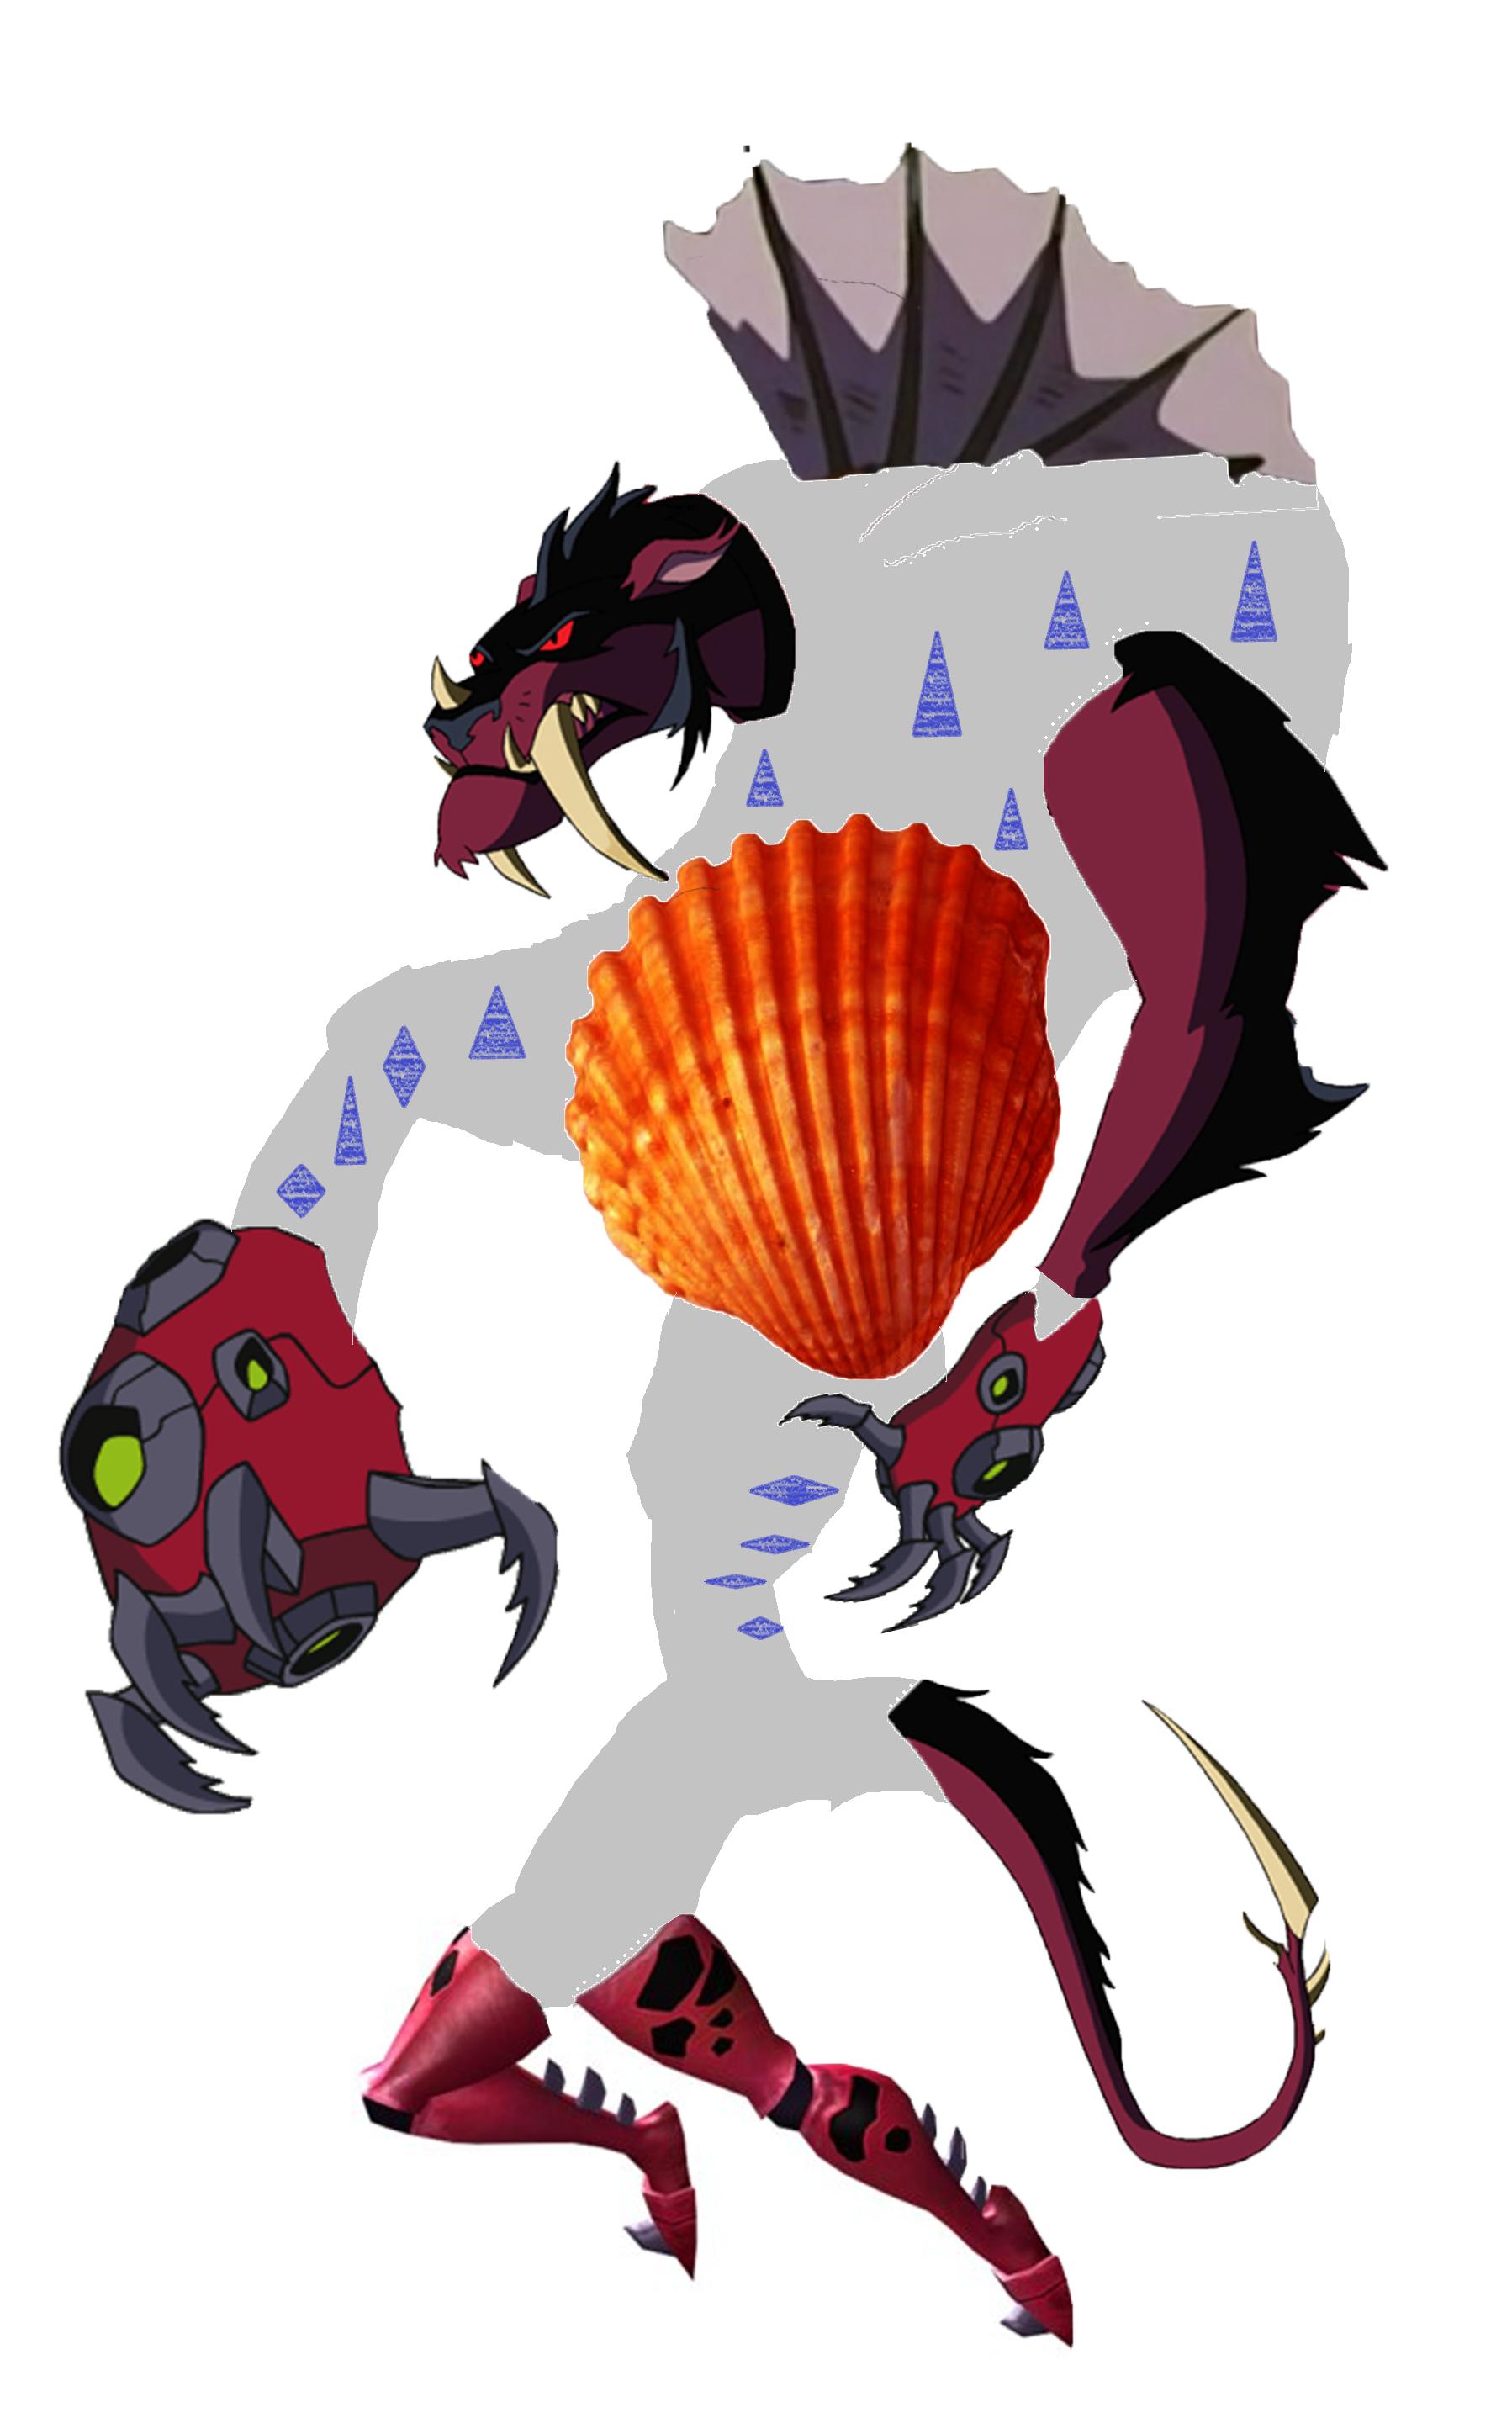 Aquagon (Galactic Smash Character)